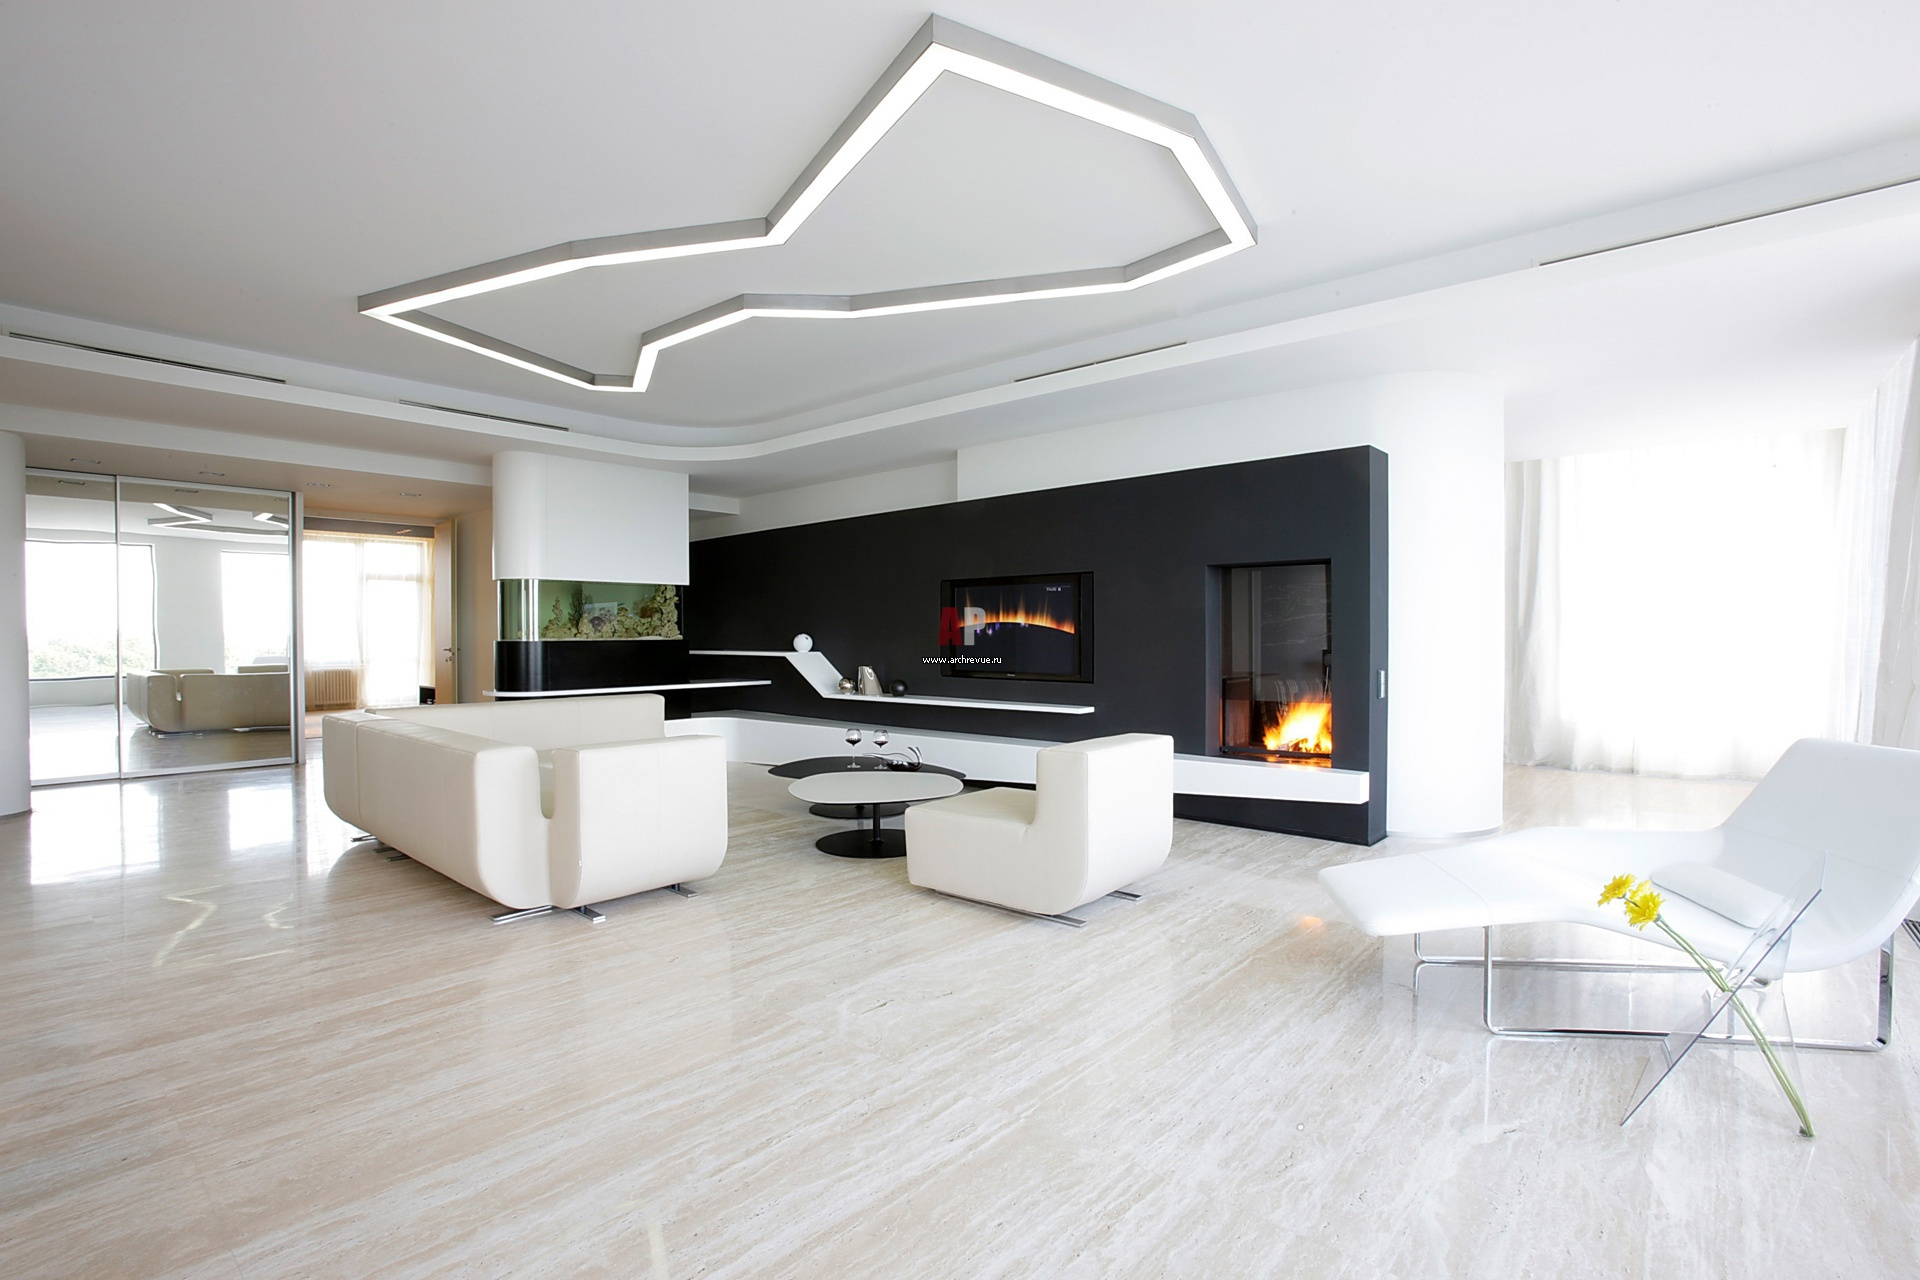 Интерьер жилой комнаты в стиле минимализм